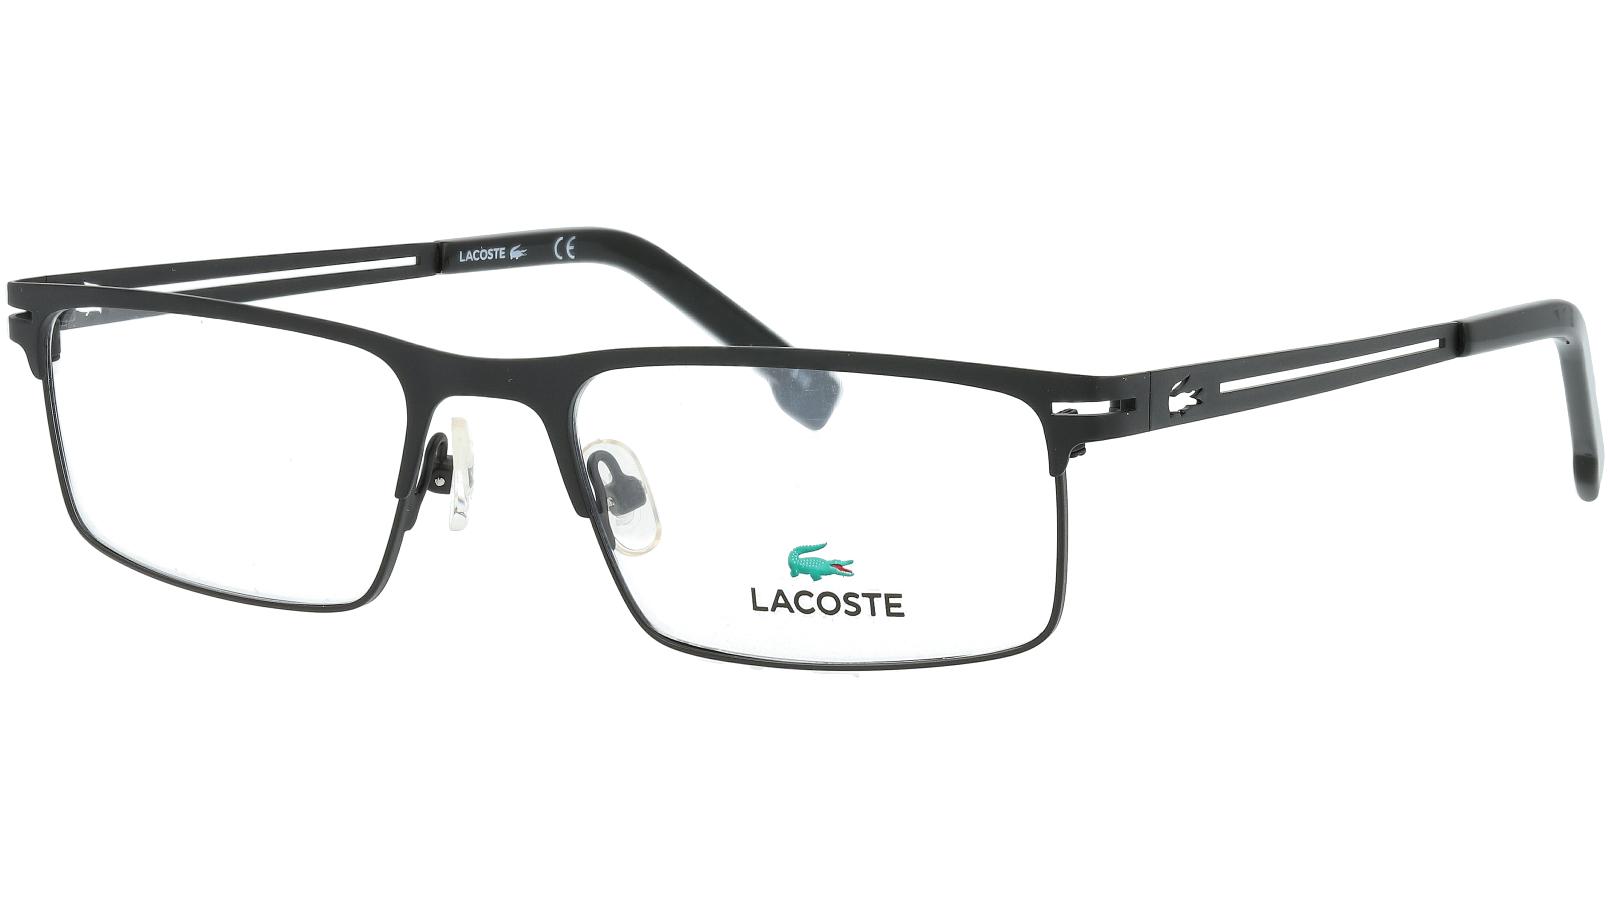 LACOSTE L2122 001 52 BLACK Glasses